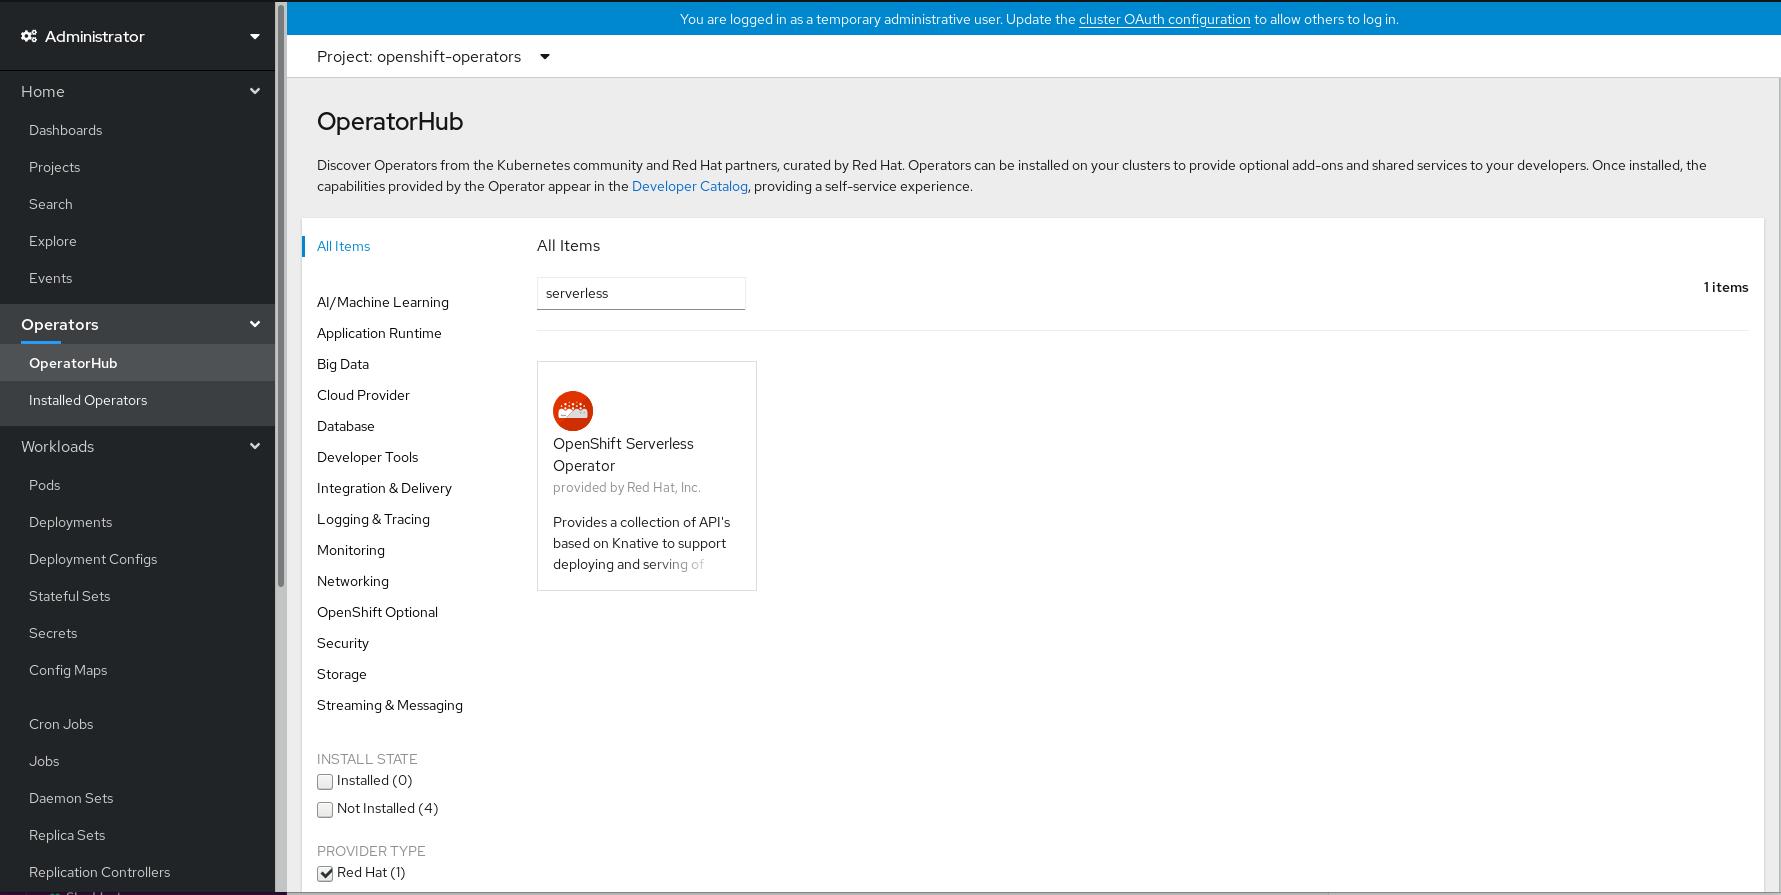 Azure Red Hat OpenShift Web コンソールでの OpenShift Serverless Operator